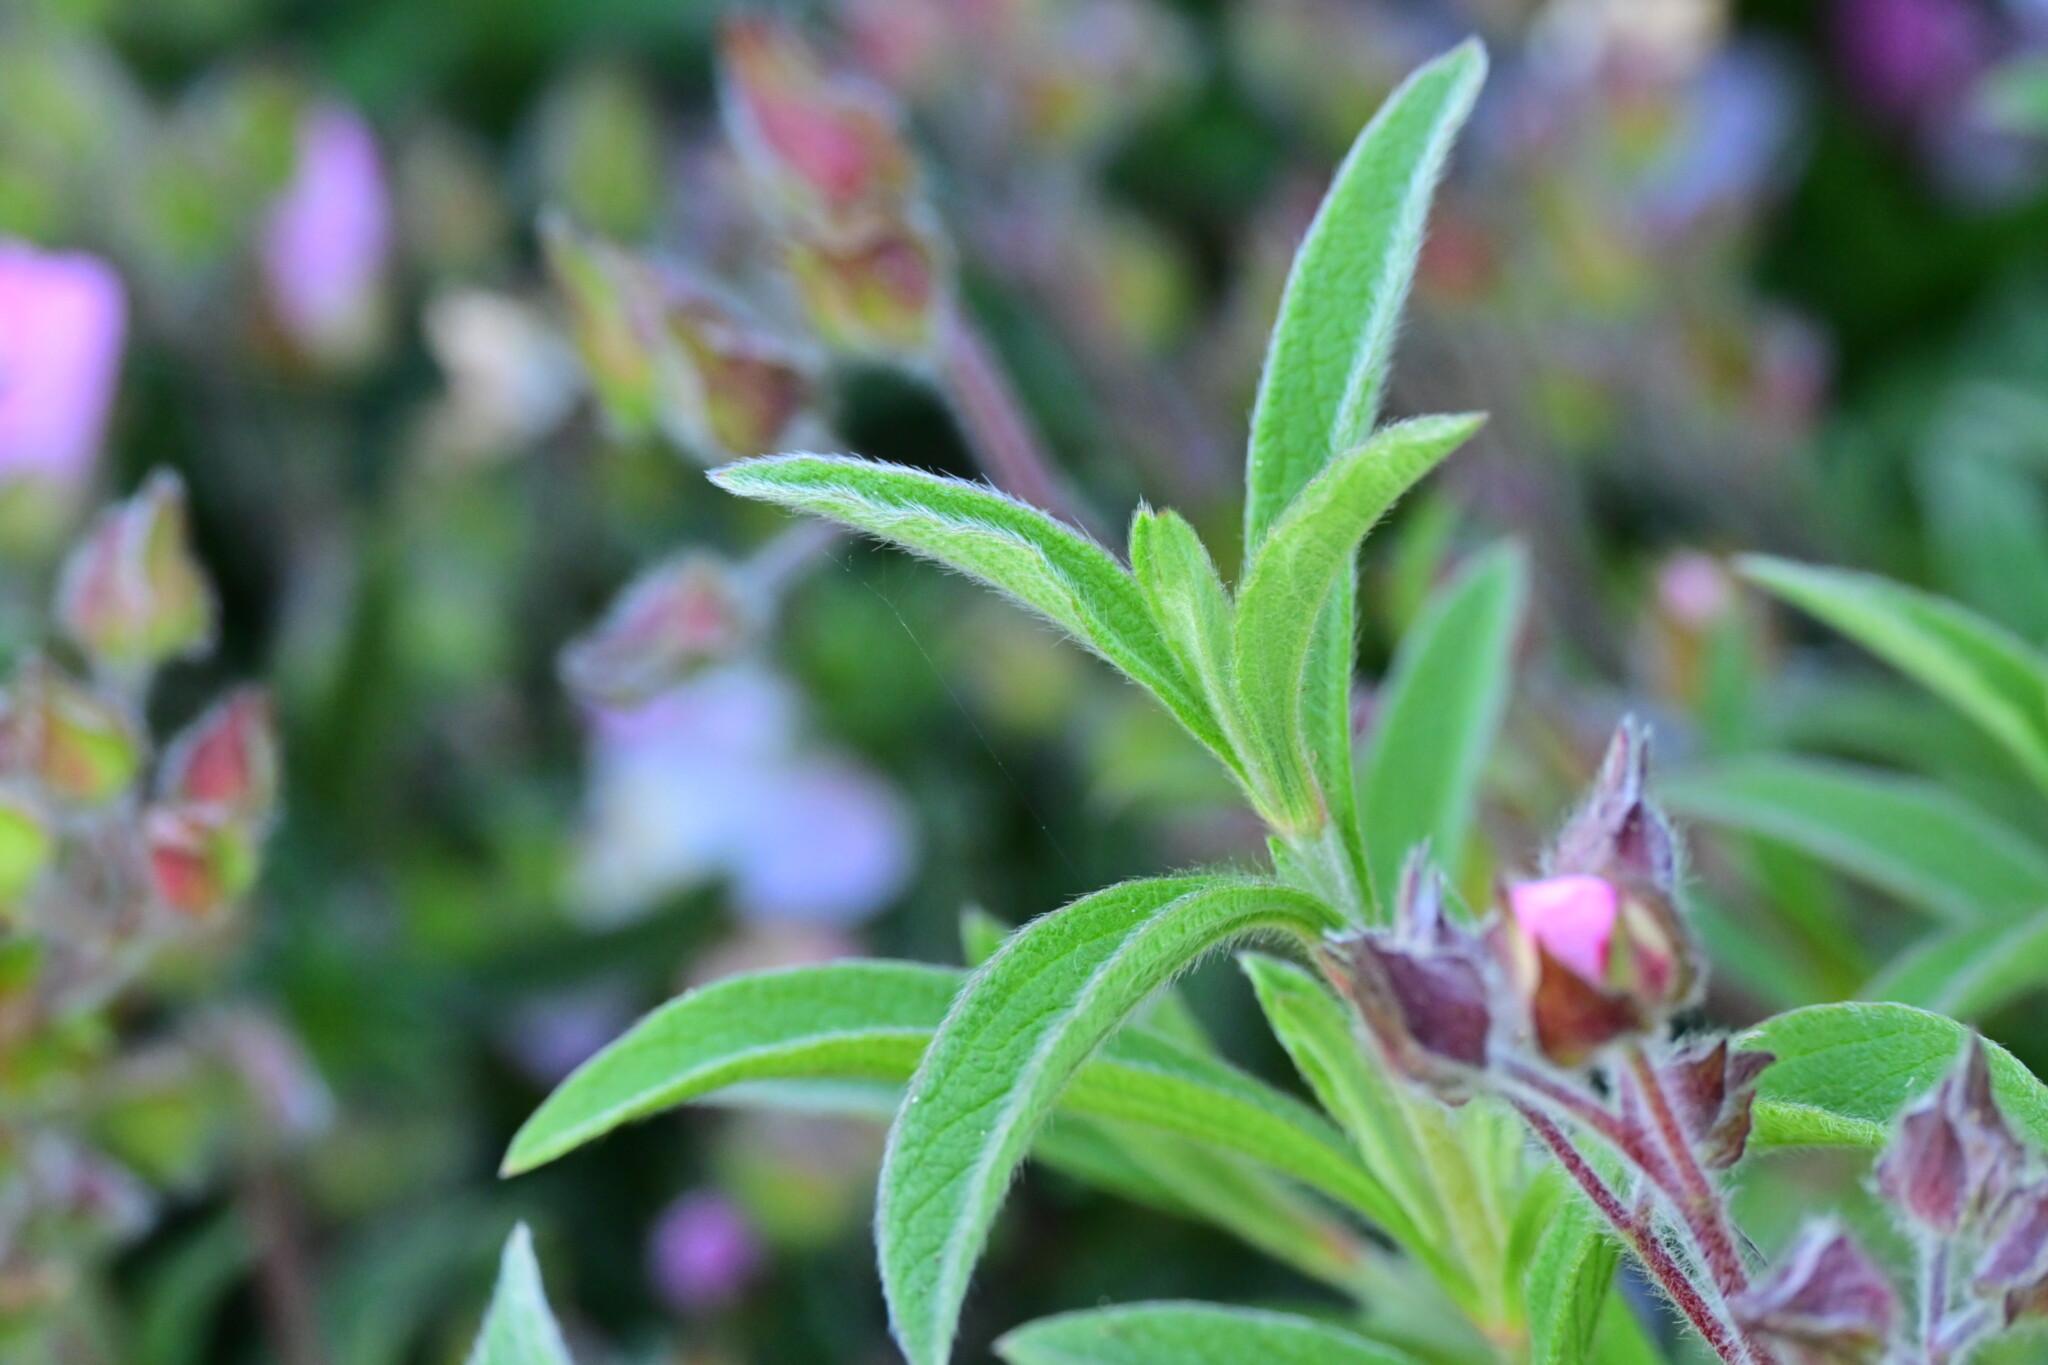 PLANT OF THE WEEK #37: Cistus x argenteus 'Silver Pink'